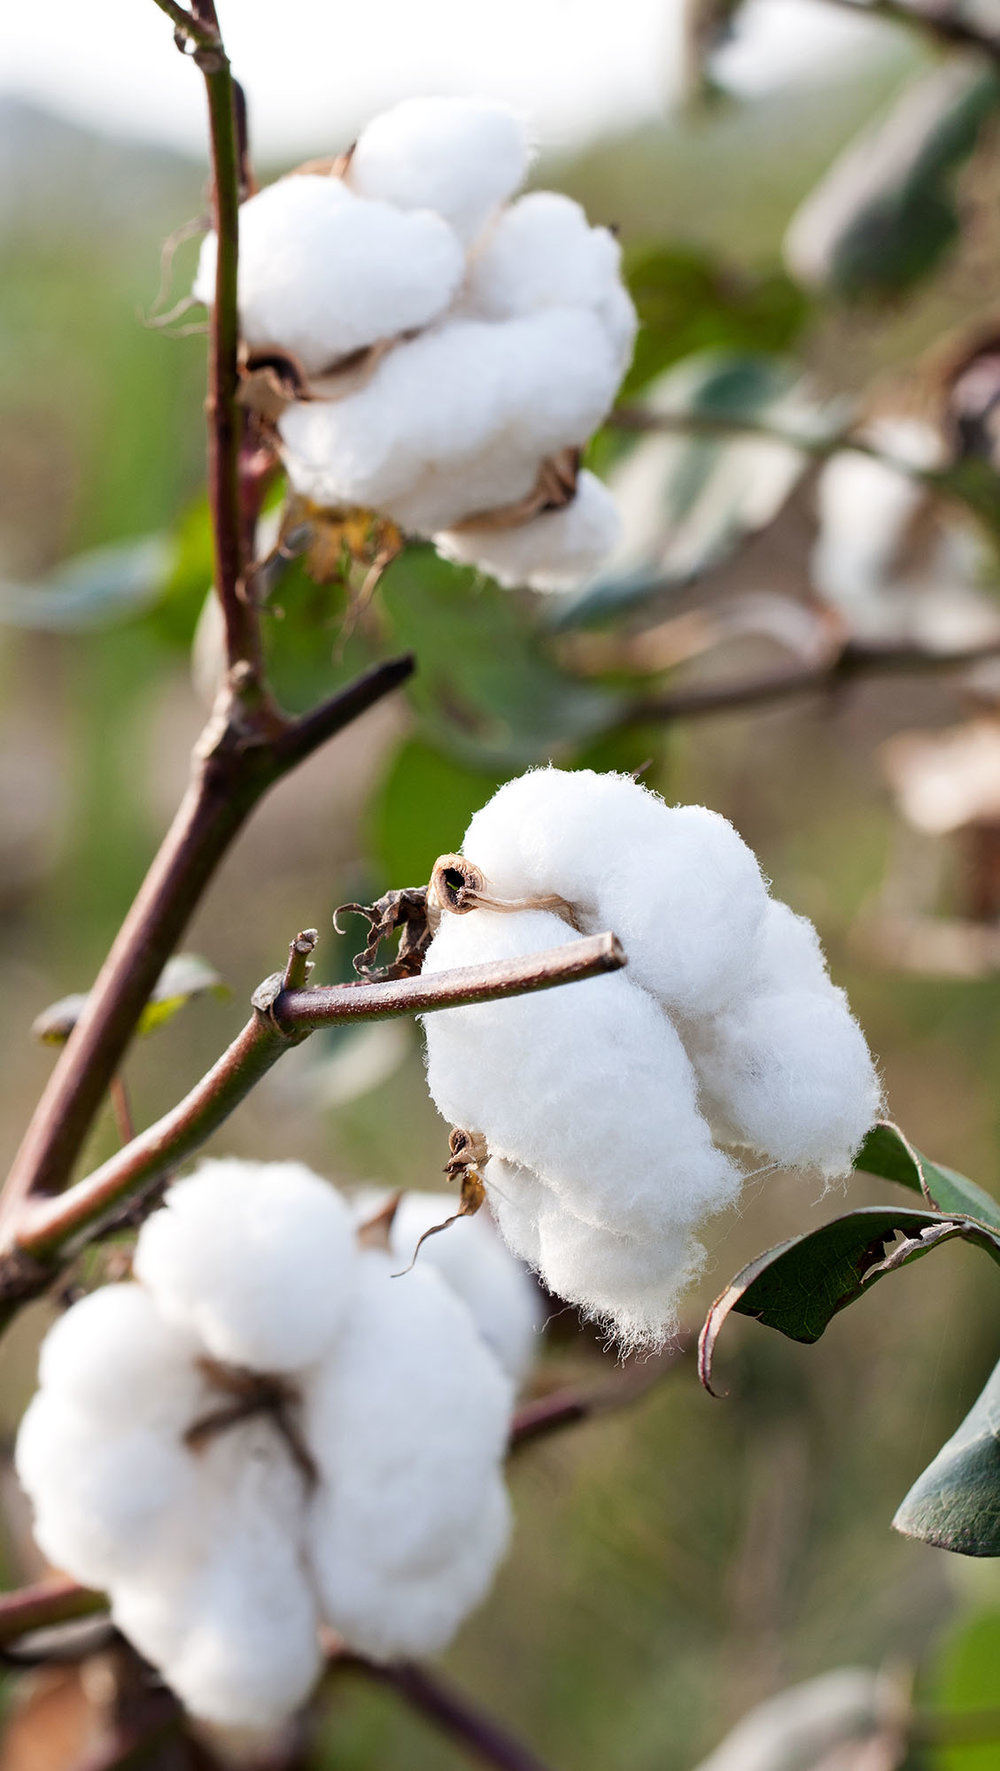 Bio-Baumwoll-Frucht |  Organic cotton plant